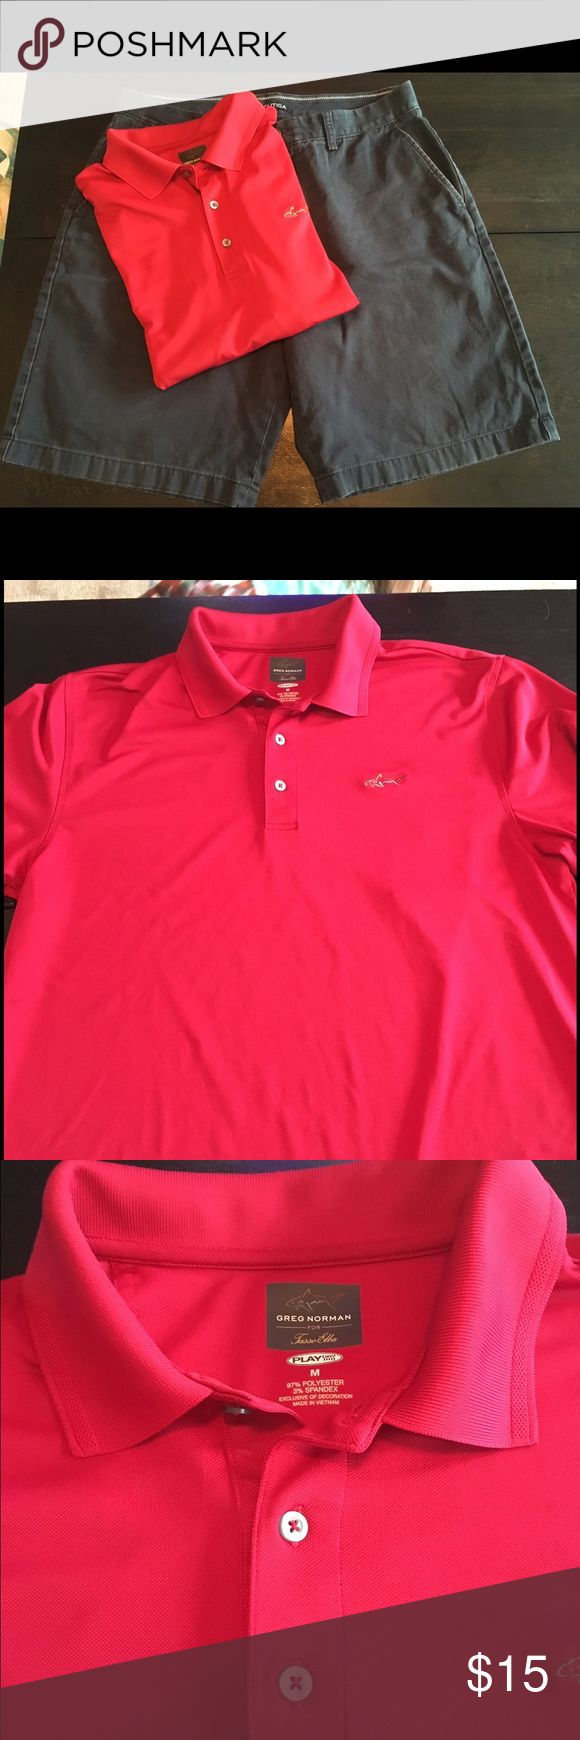 Greg Norman golf shirt Red Greg Norman golf shirt greg norman Shirts Polos